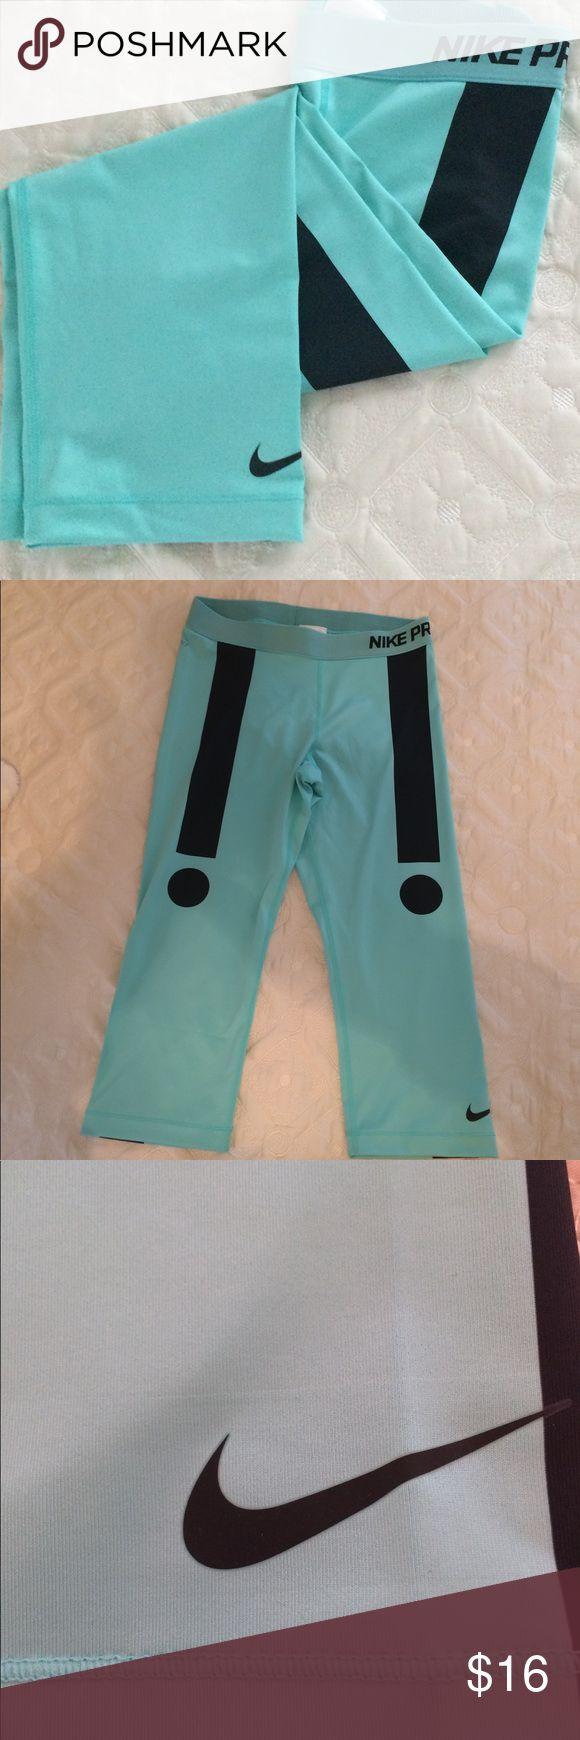 Nike Pro Capri workout pants size Large Nike Pro NWOT! Capri workout pants. Make a statement in these teal and black Nike Pro pants. Take your workout to the next level. Size Large Nike Pants